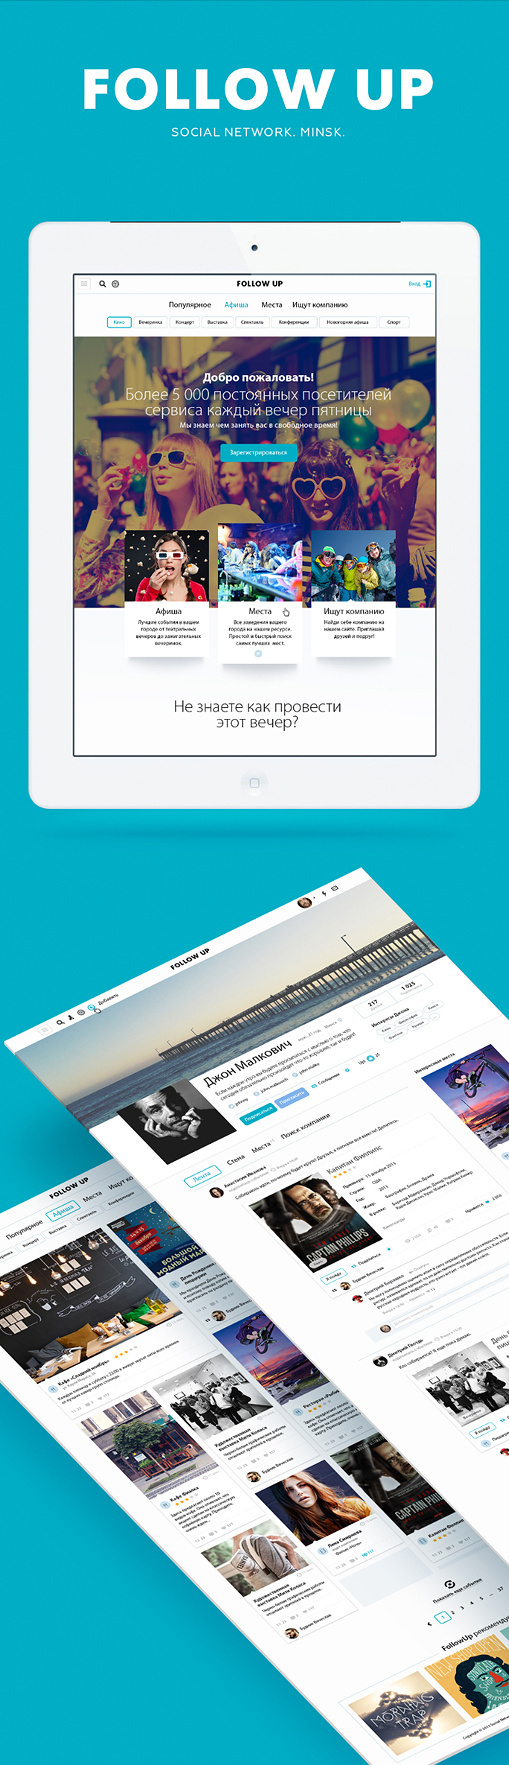 social network «follow up» minsk #site #web